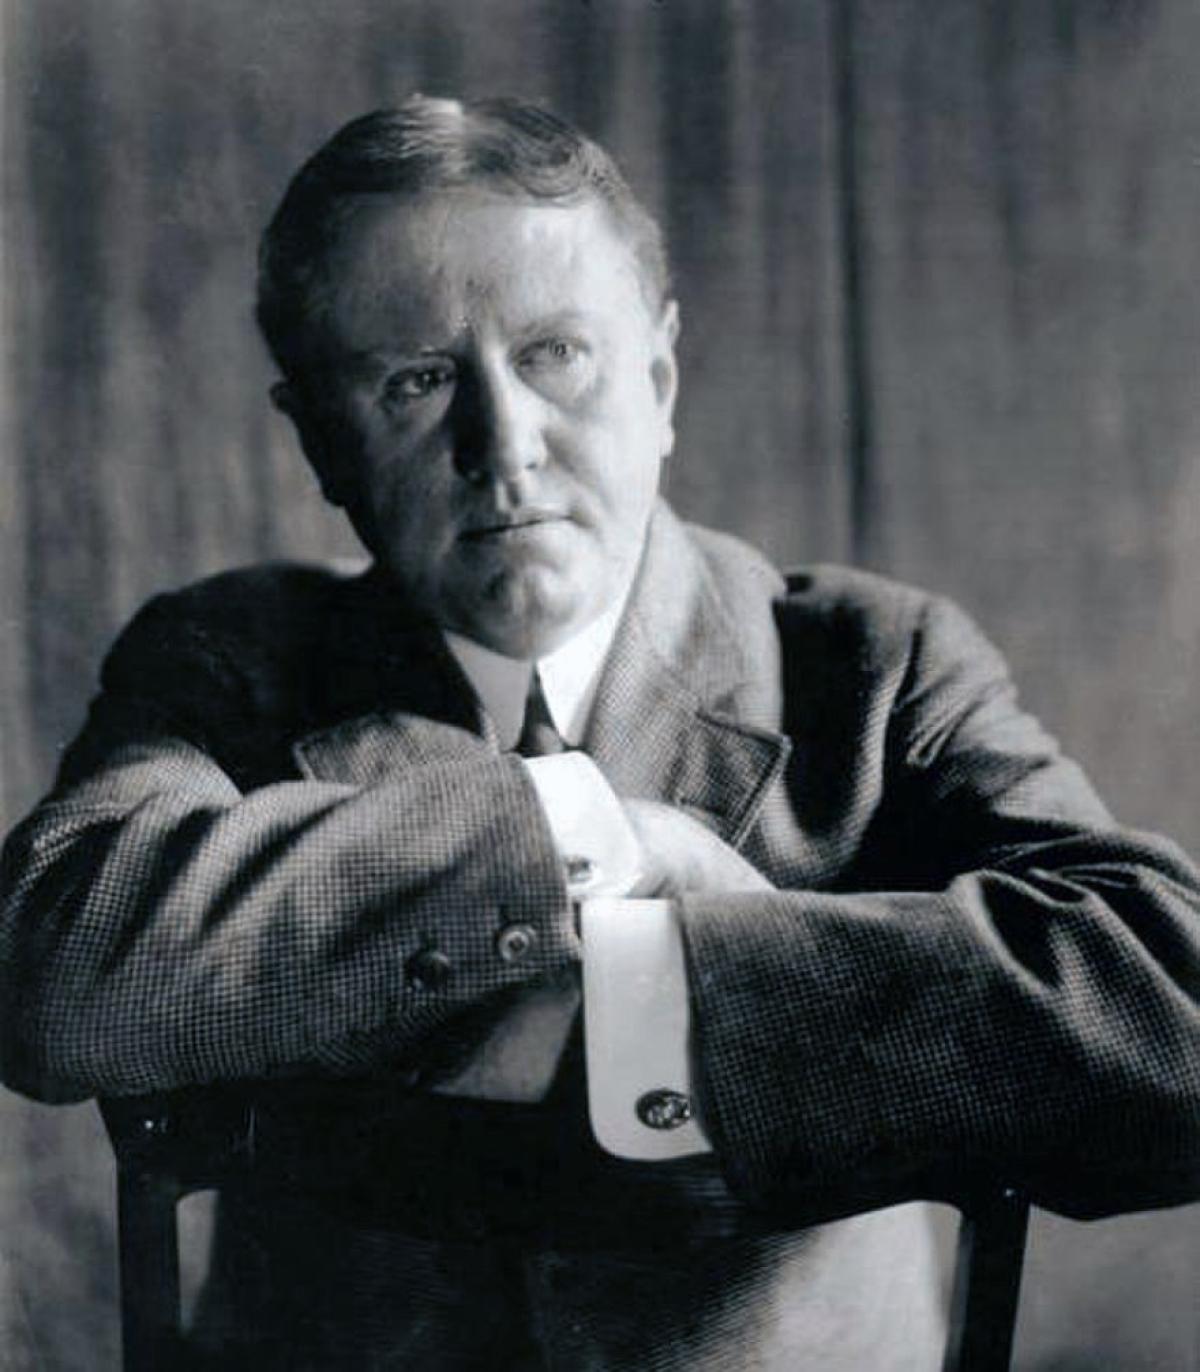 O. Henry, American short story writer